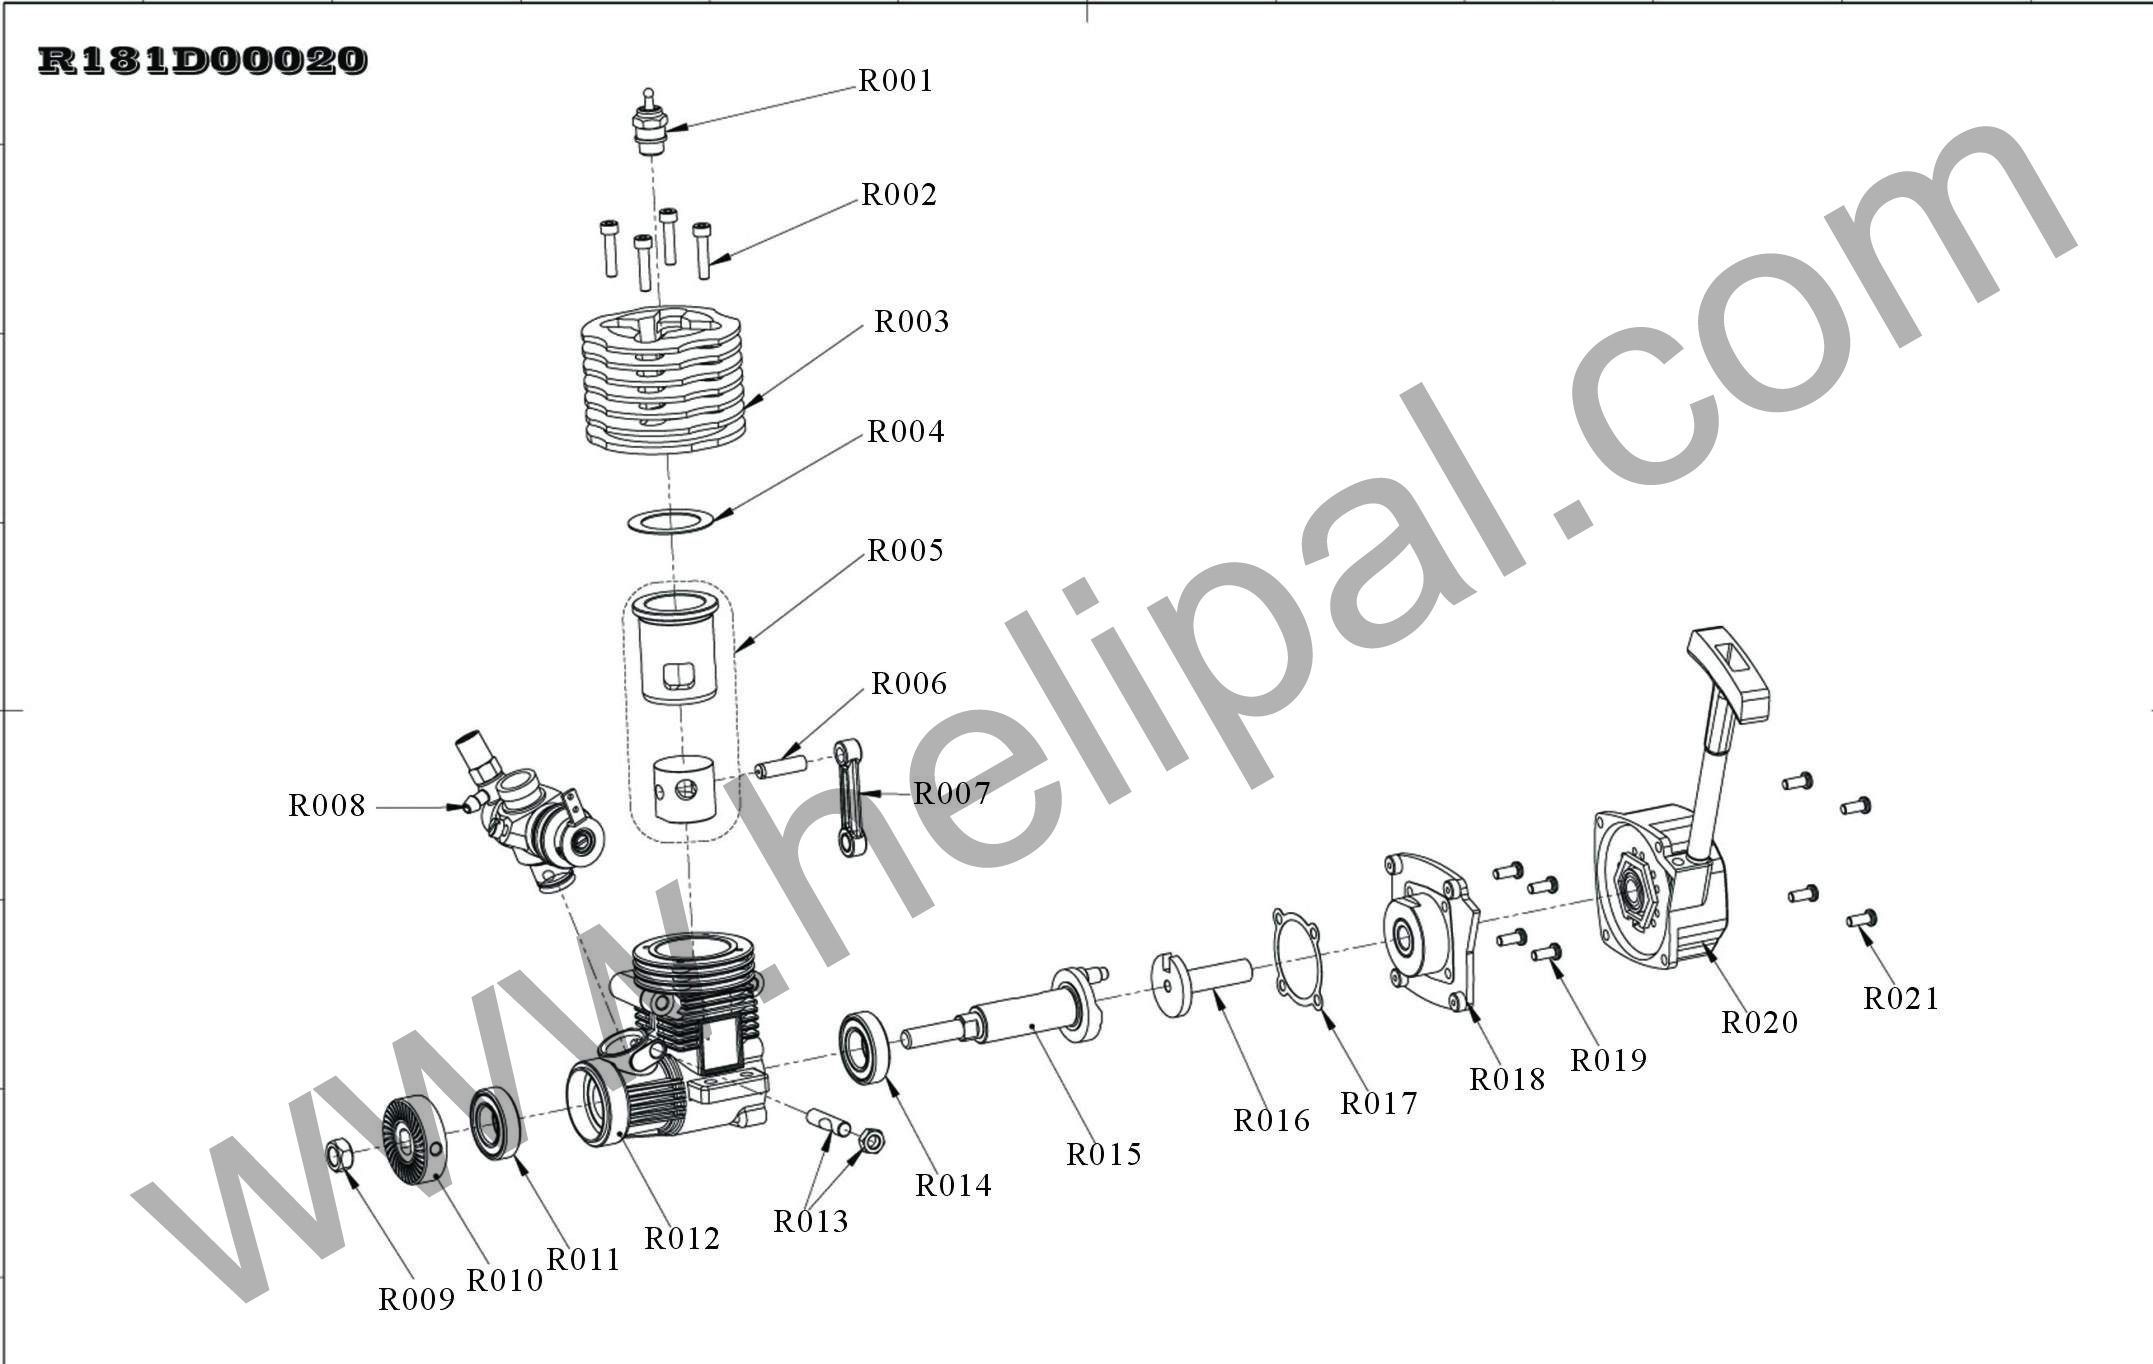 2008 Dodge Nitro Engine Diagram 2000 Hyundai Elantra Fuel Pump Wiring 0f Igesetze De Explosion For Hsp 16 18 Class Click To Enlarge Rh Pinterest Ca 4 0